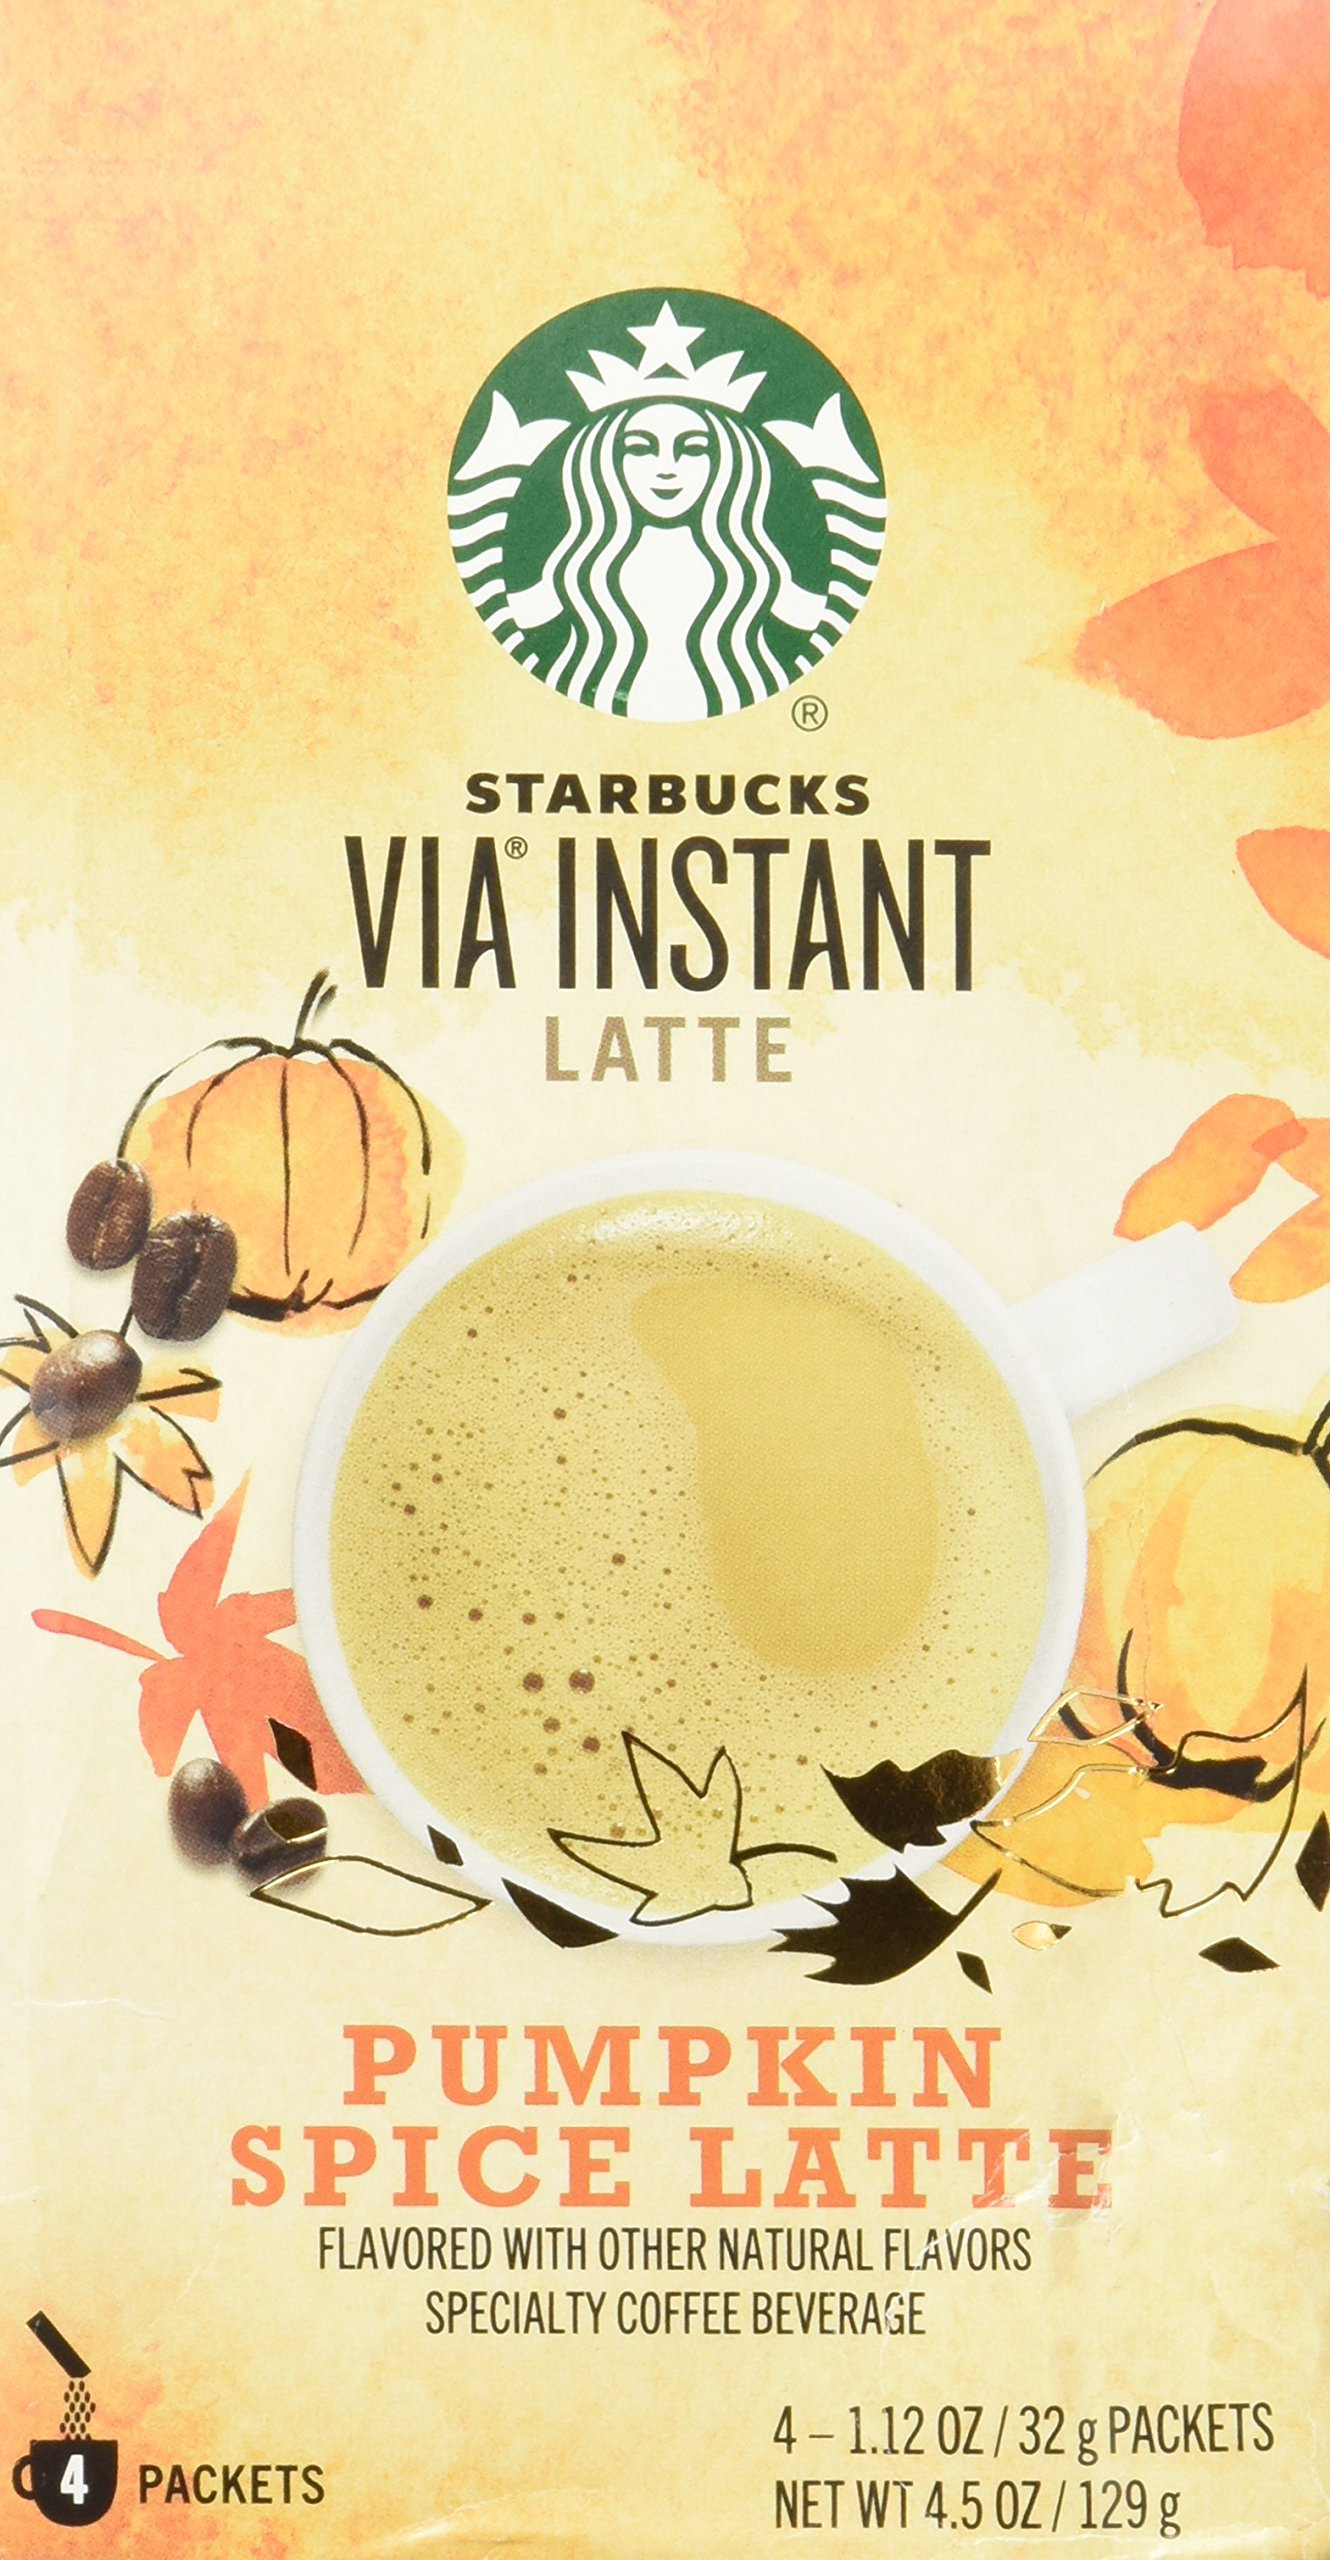 Starbucks Via Instant Pumpkin Spice Latte, 4 Packets, 4.5 Oz.